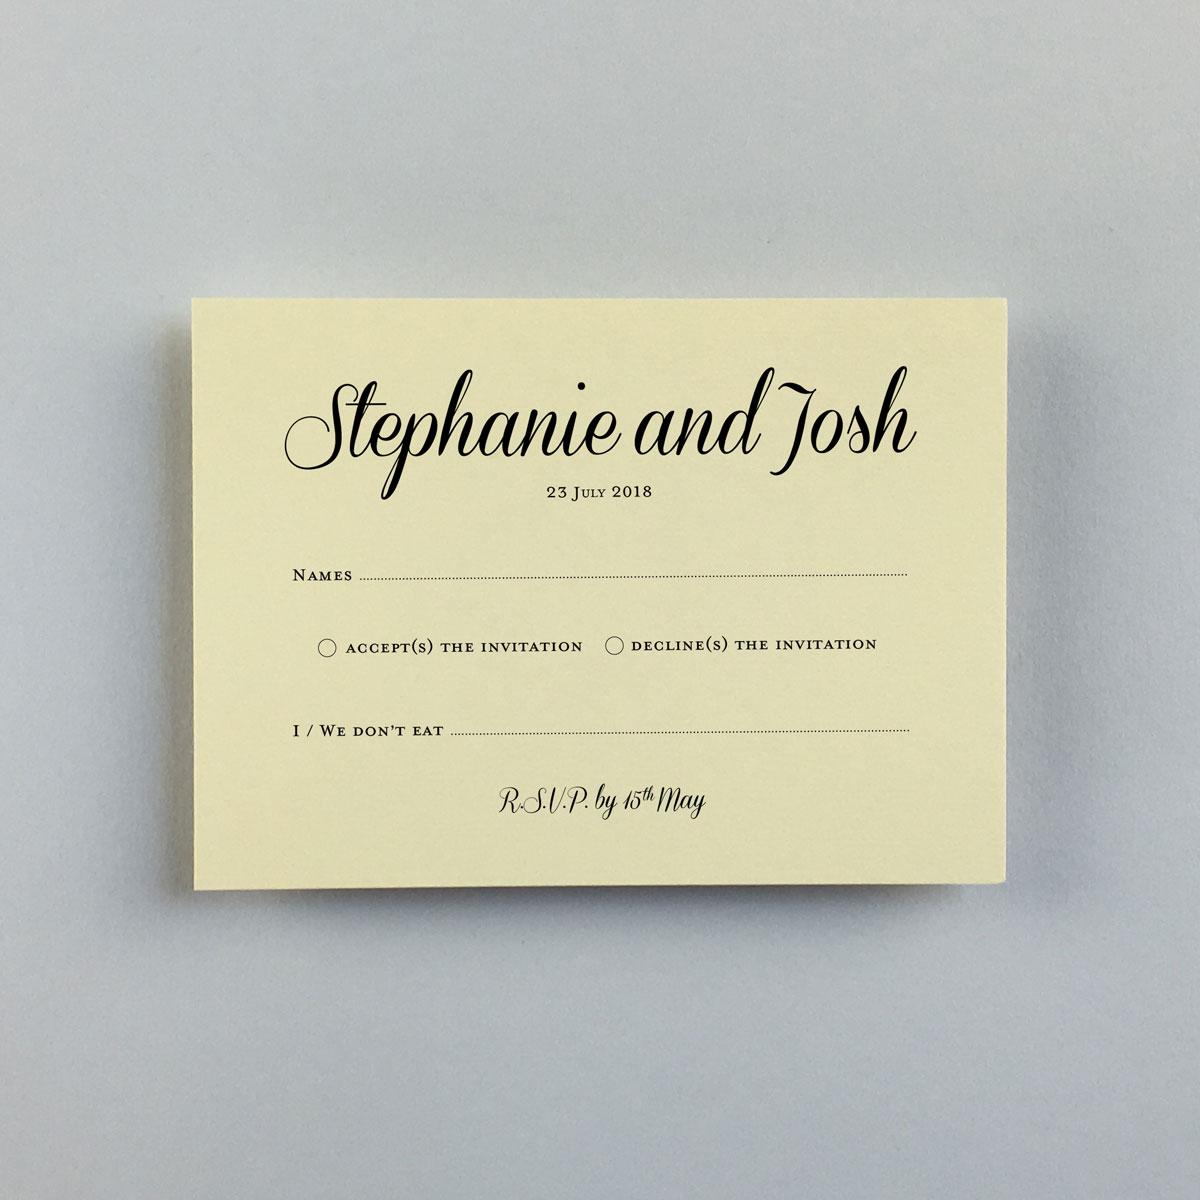 Stephanie Reply Cards - Wedding Stationery